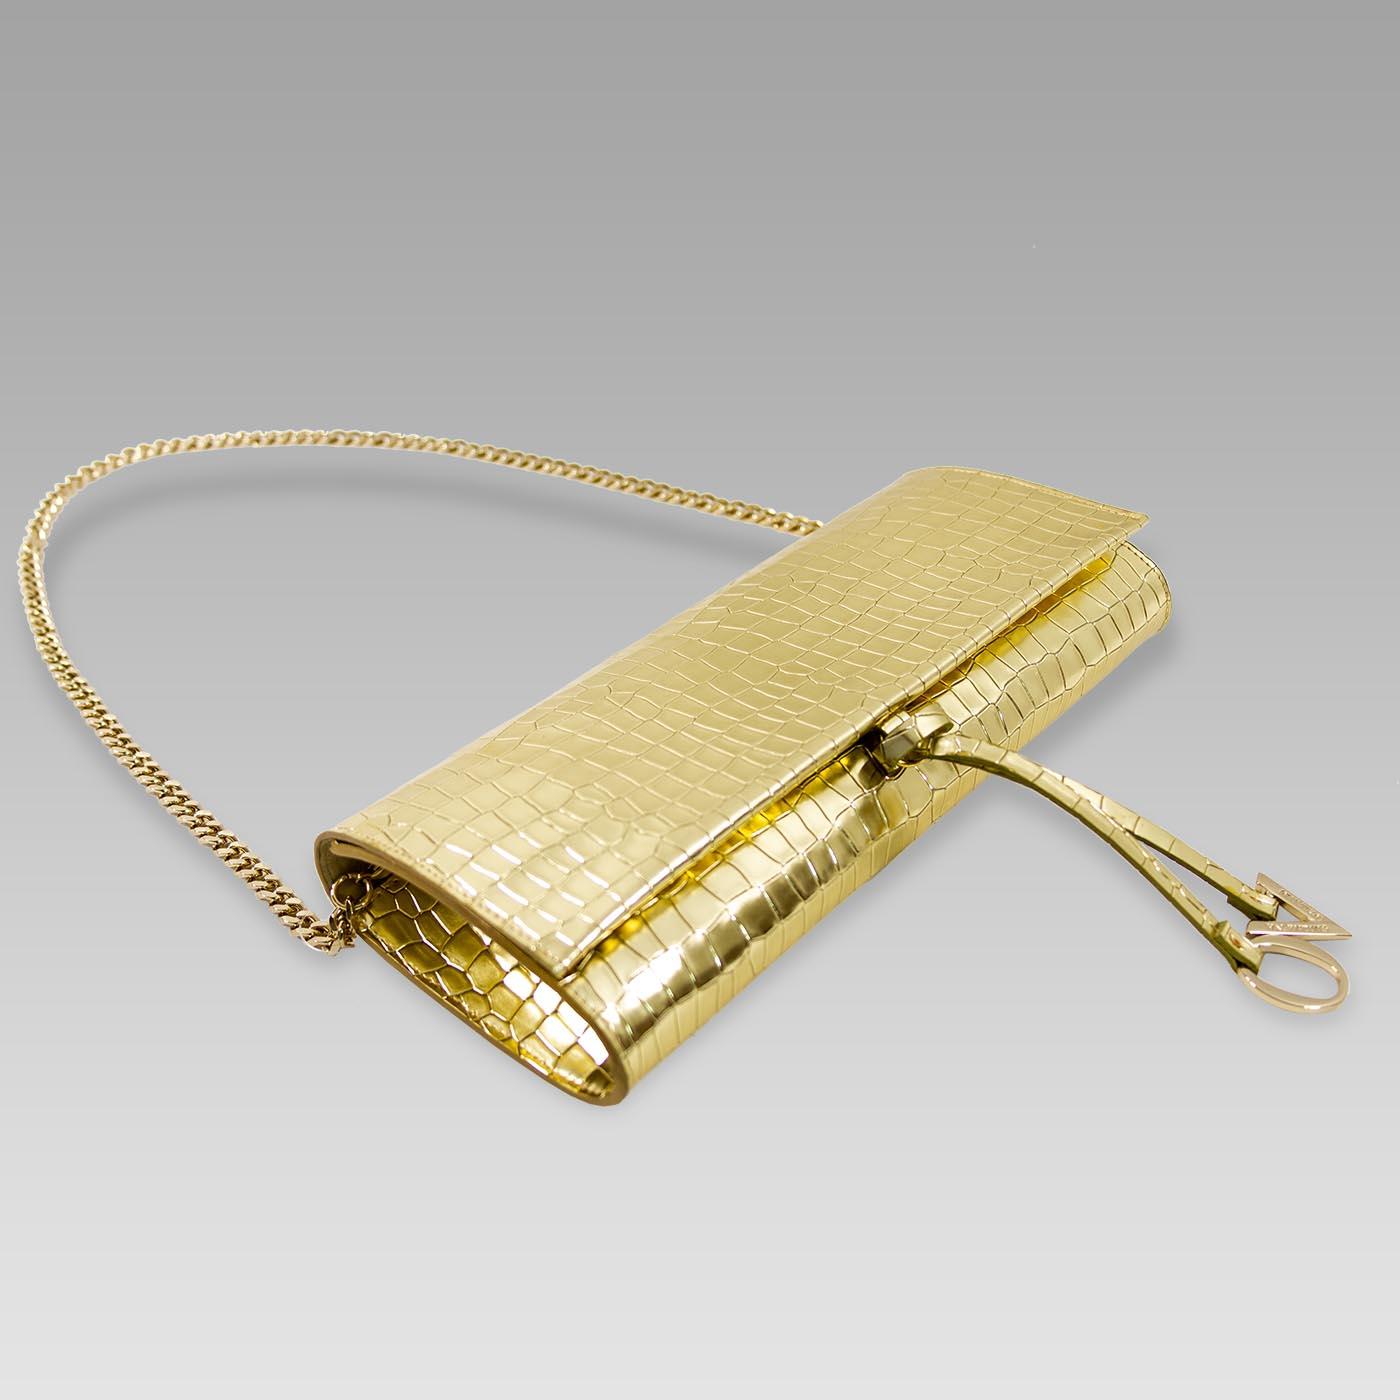 Valentino_Orlandi_Envelope_Clutch_Purse_Gold_Croc_Embossed_Leather_Bag_01VO6210CLGL_02.jpg